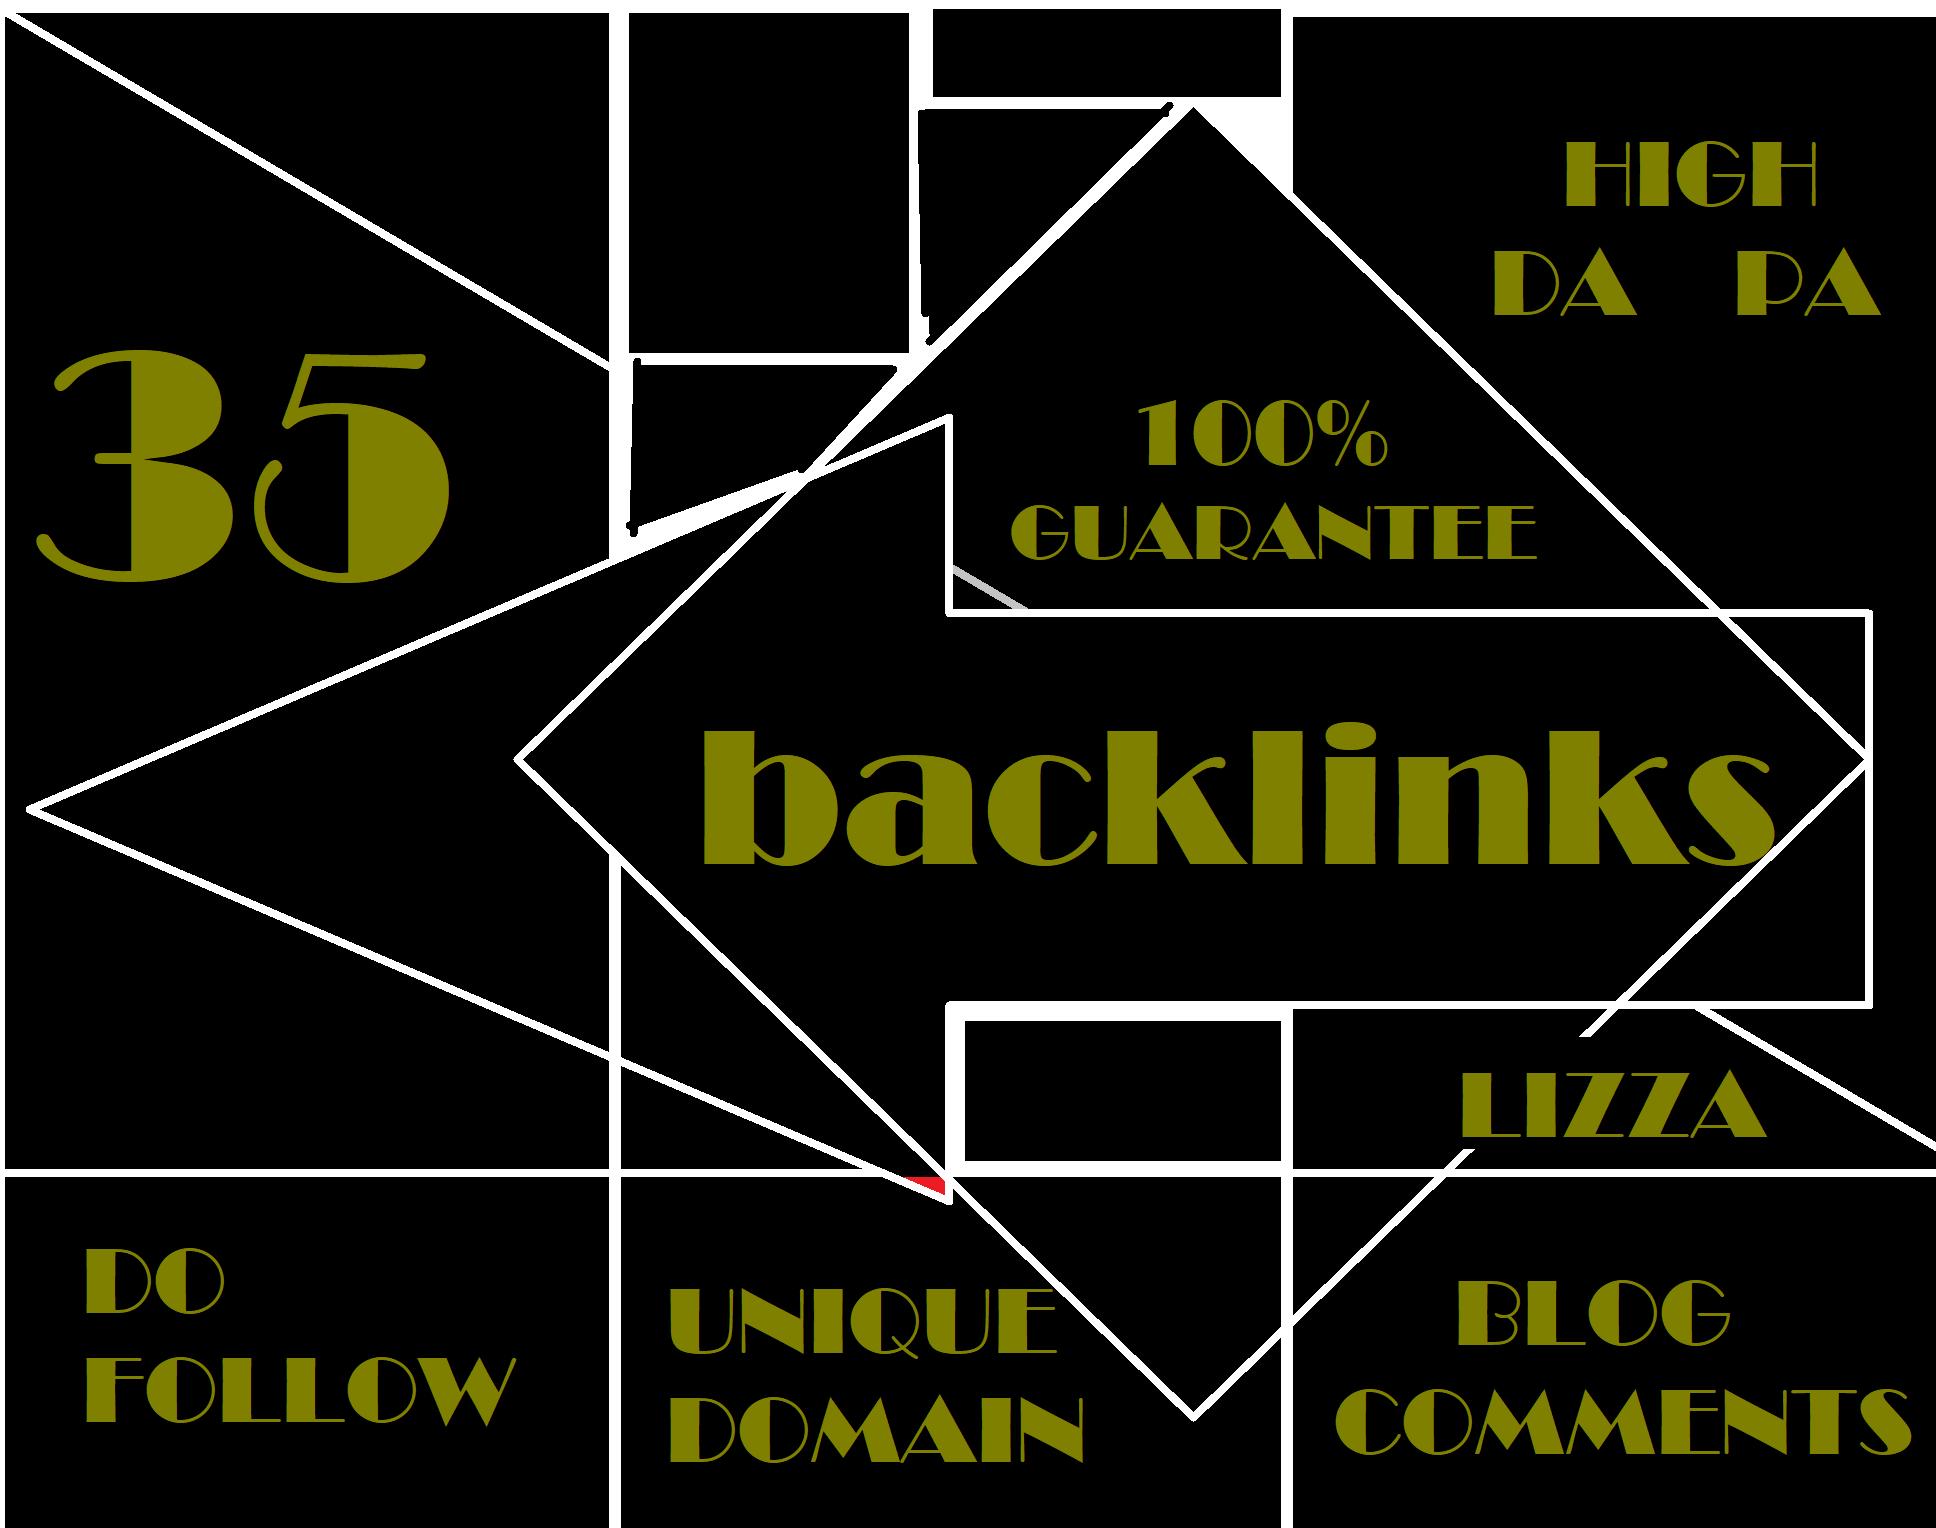 provide 35 backlinks unique domain High DA PA Do follow blog comments